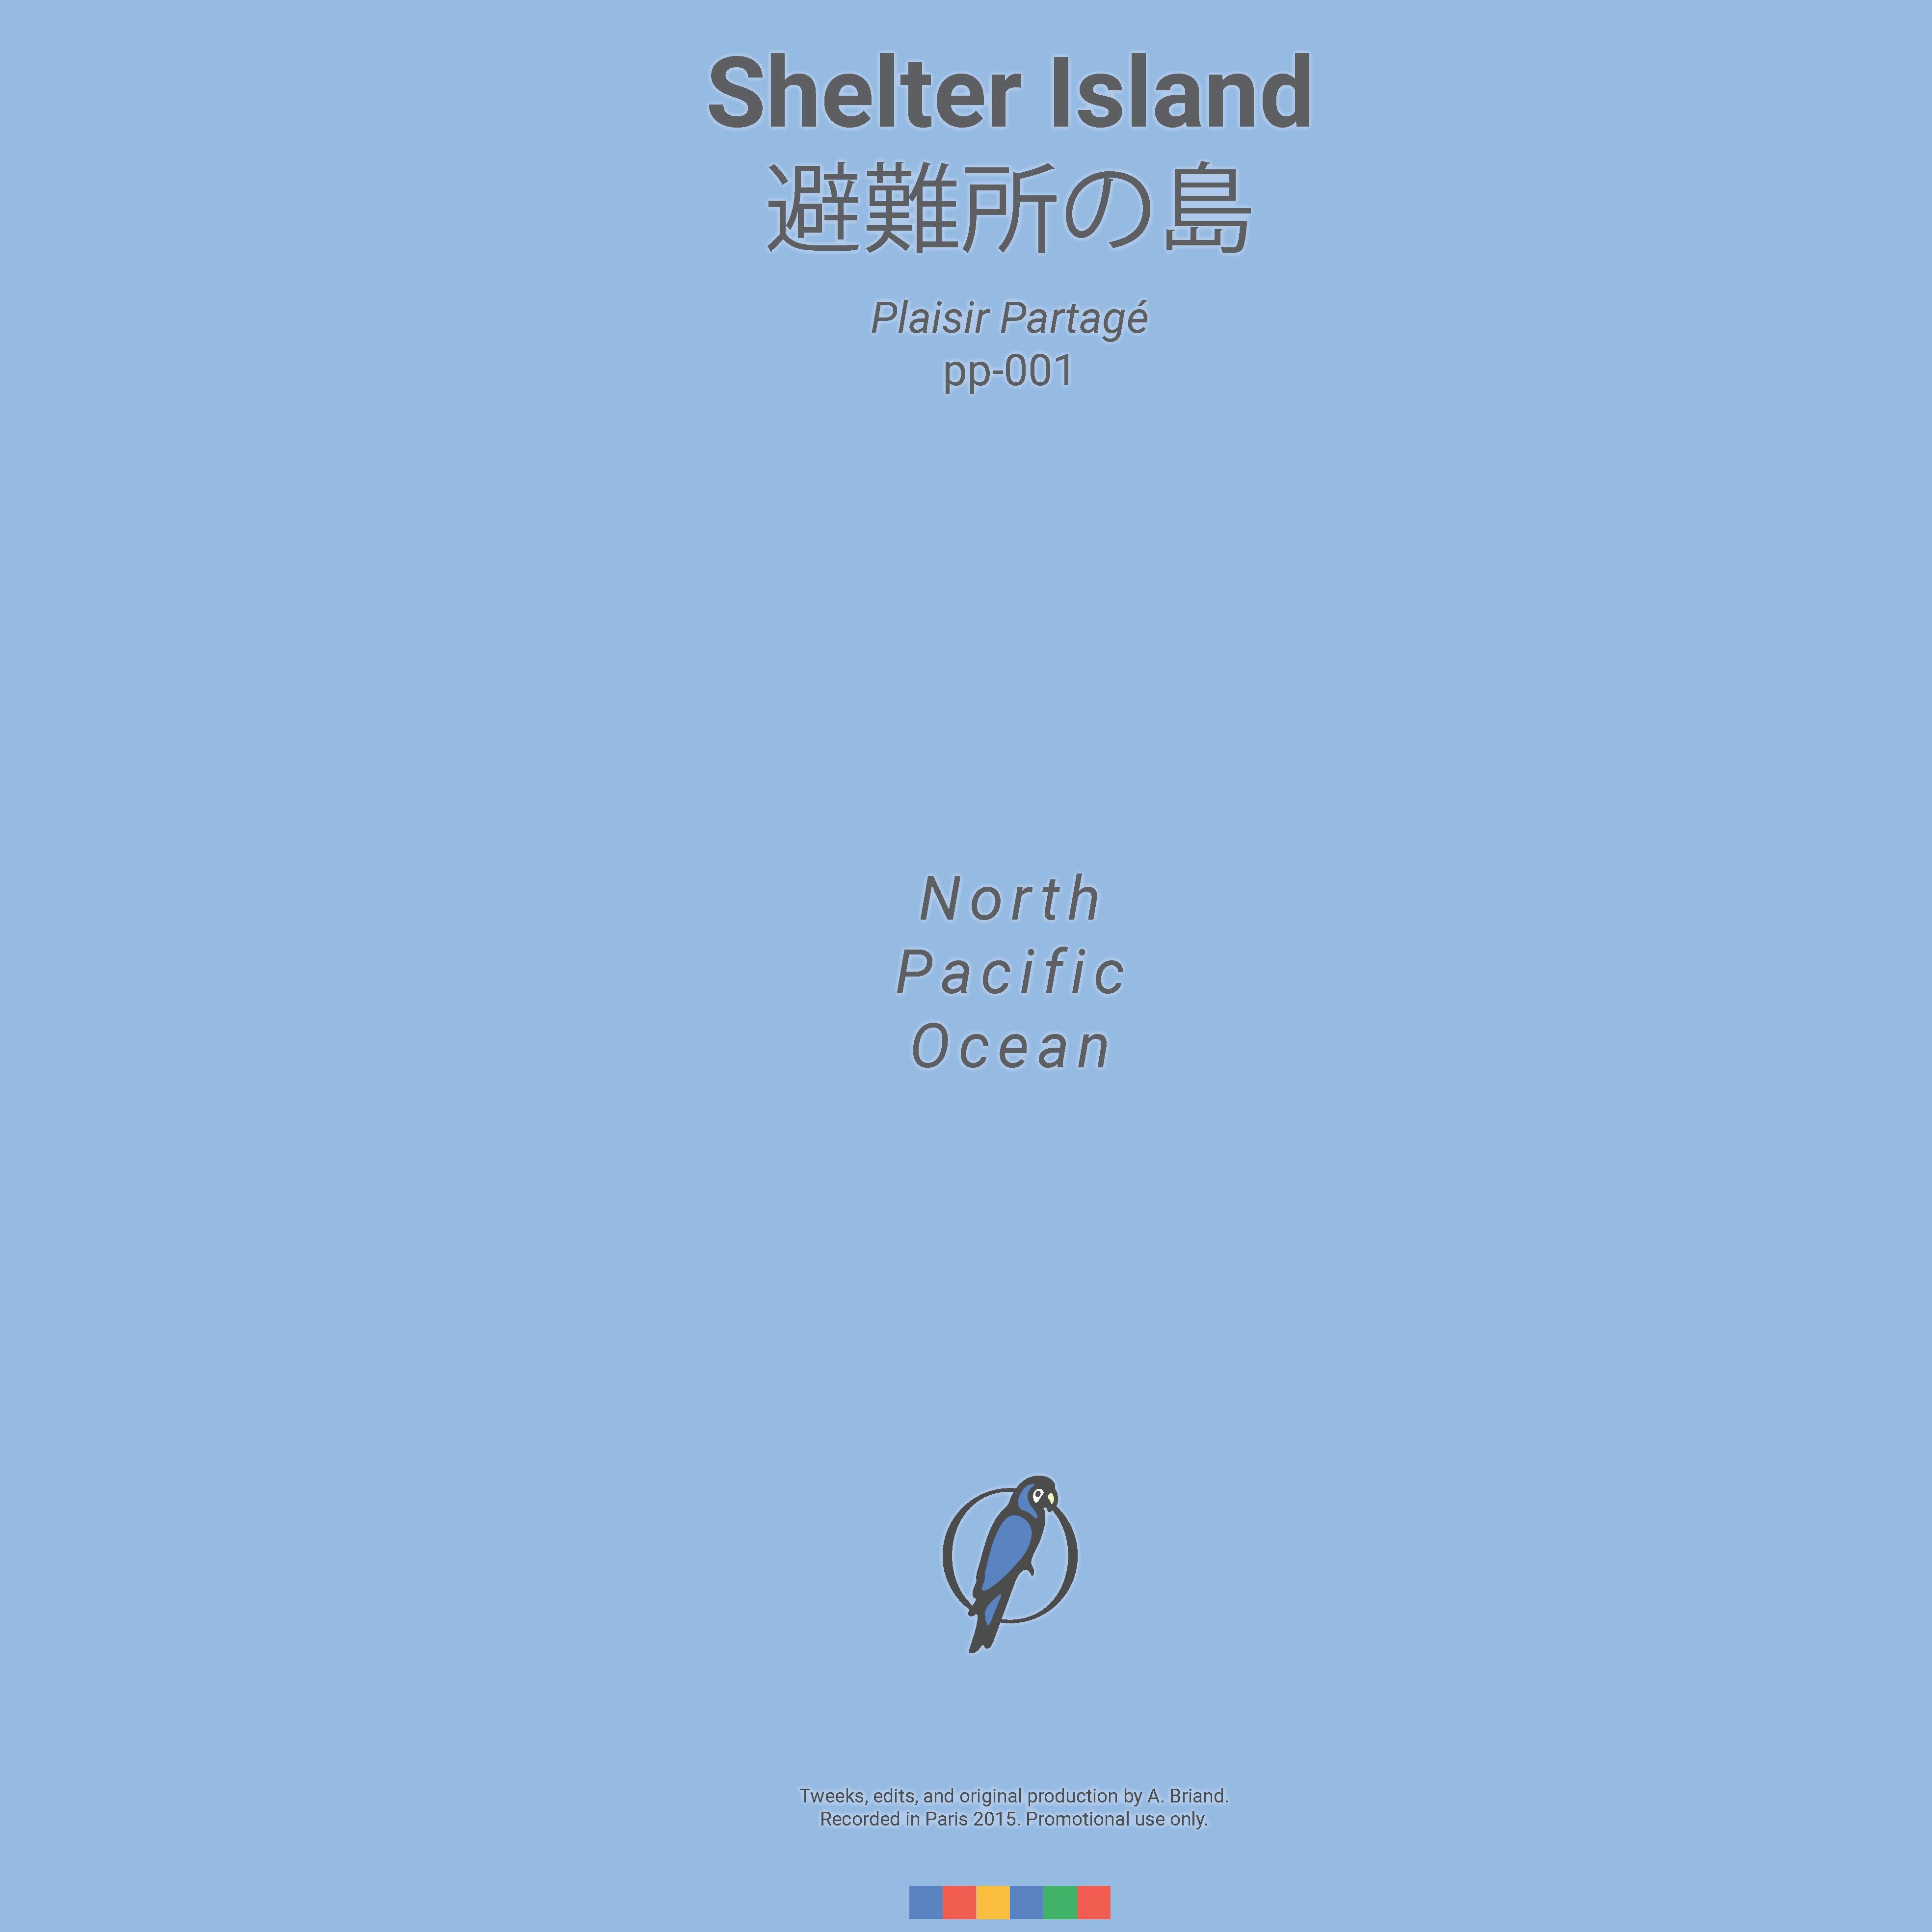 Alan Briand, Paris, France, Shelter Island, Plaisir Partagé 001, L'International Records, France,